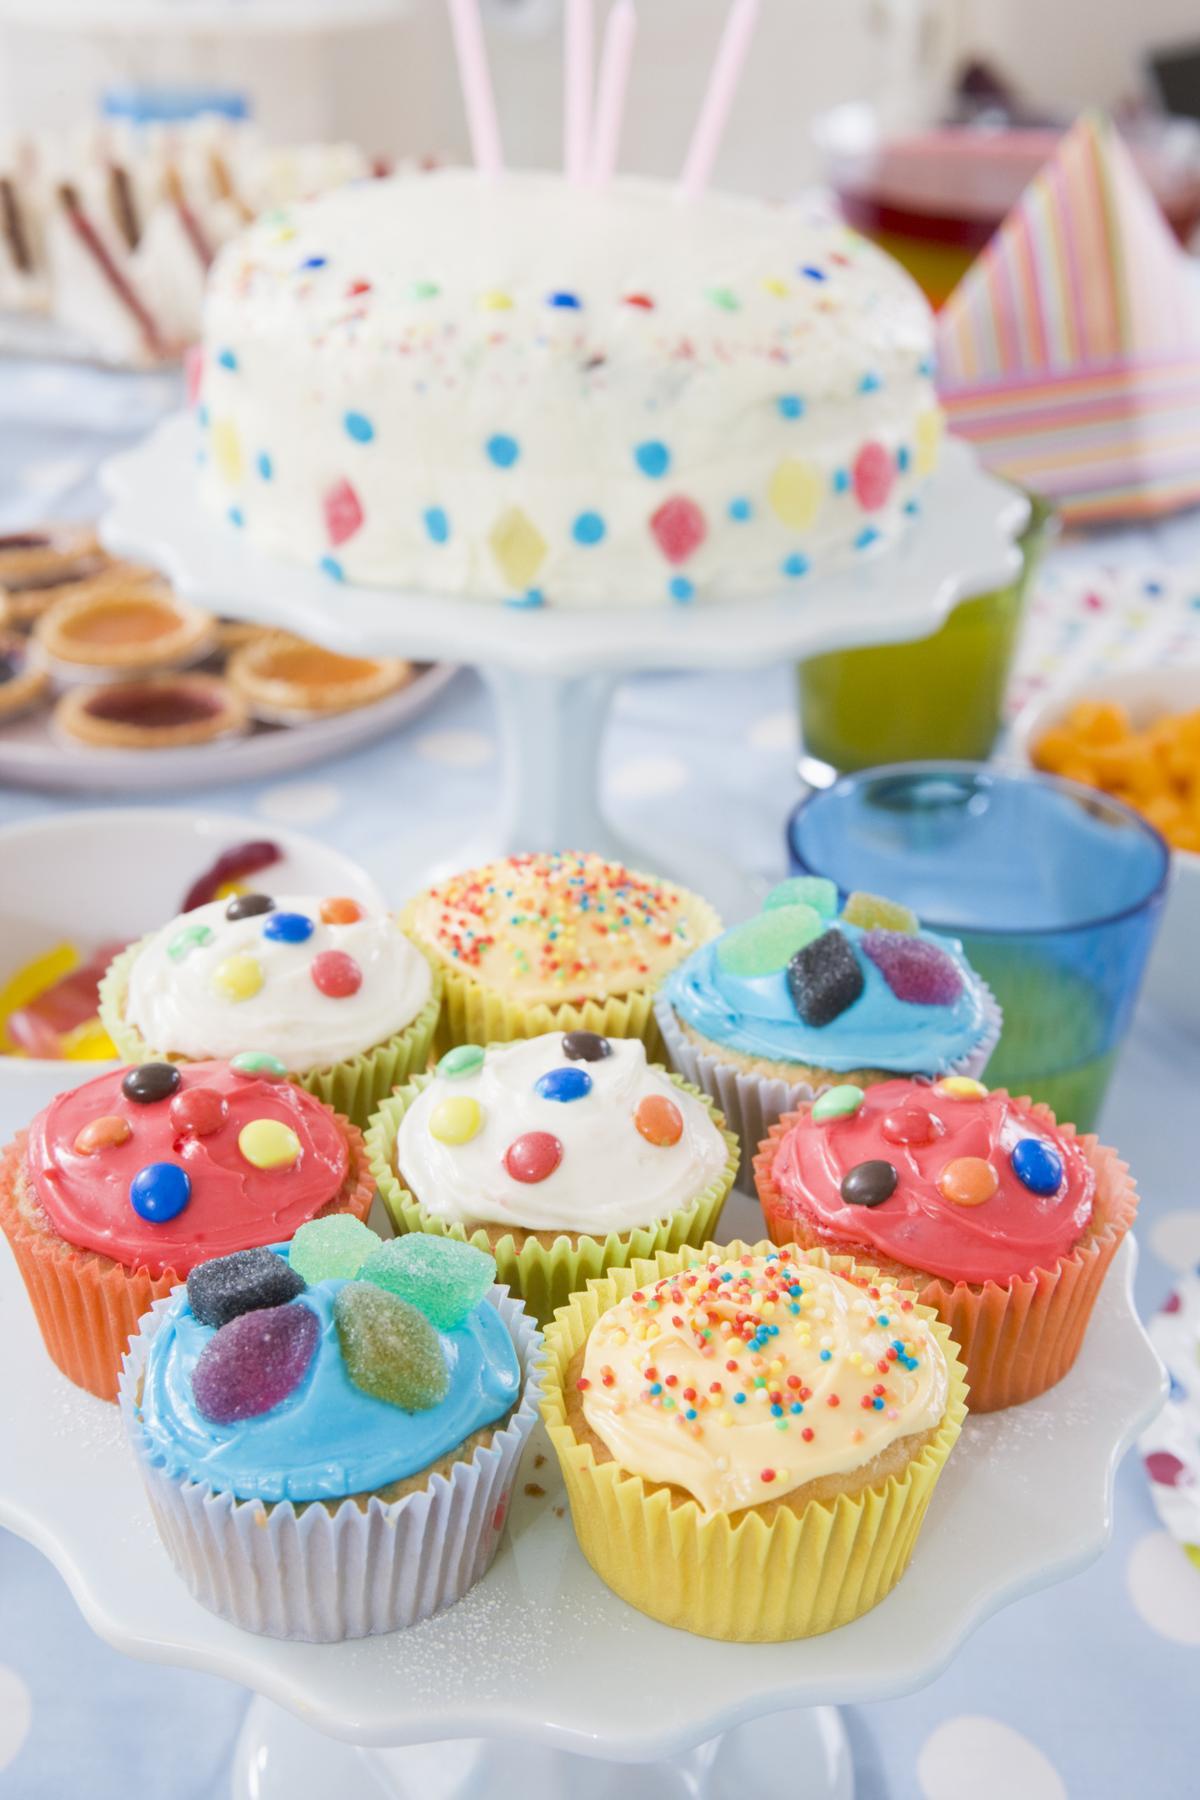 Glorify 9 Decades of Life With Splendid 90th Birthday Party Ideas